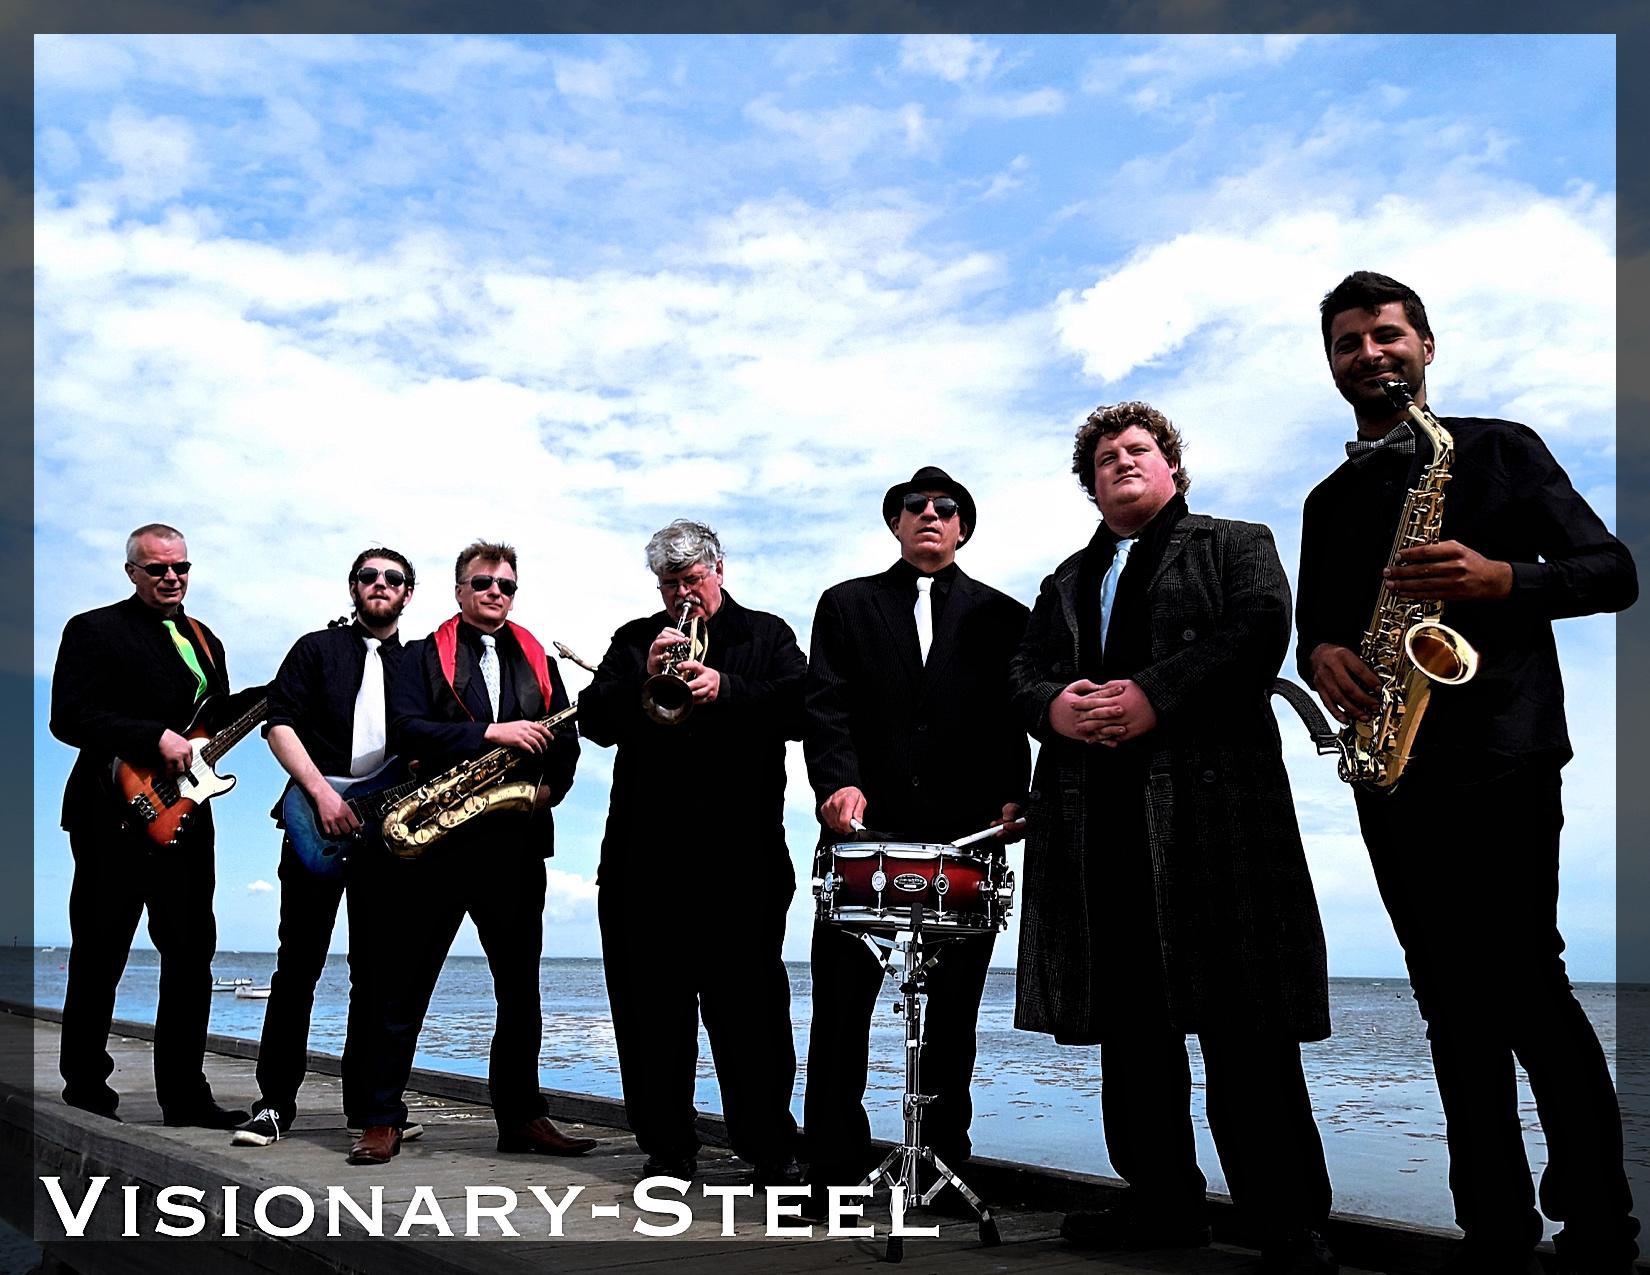 Visionary-Steel Poster 2.jpg